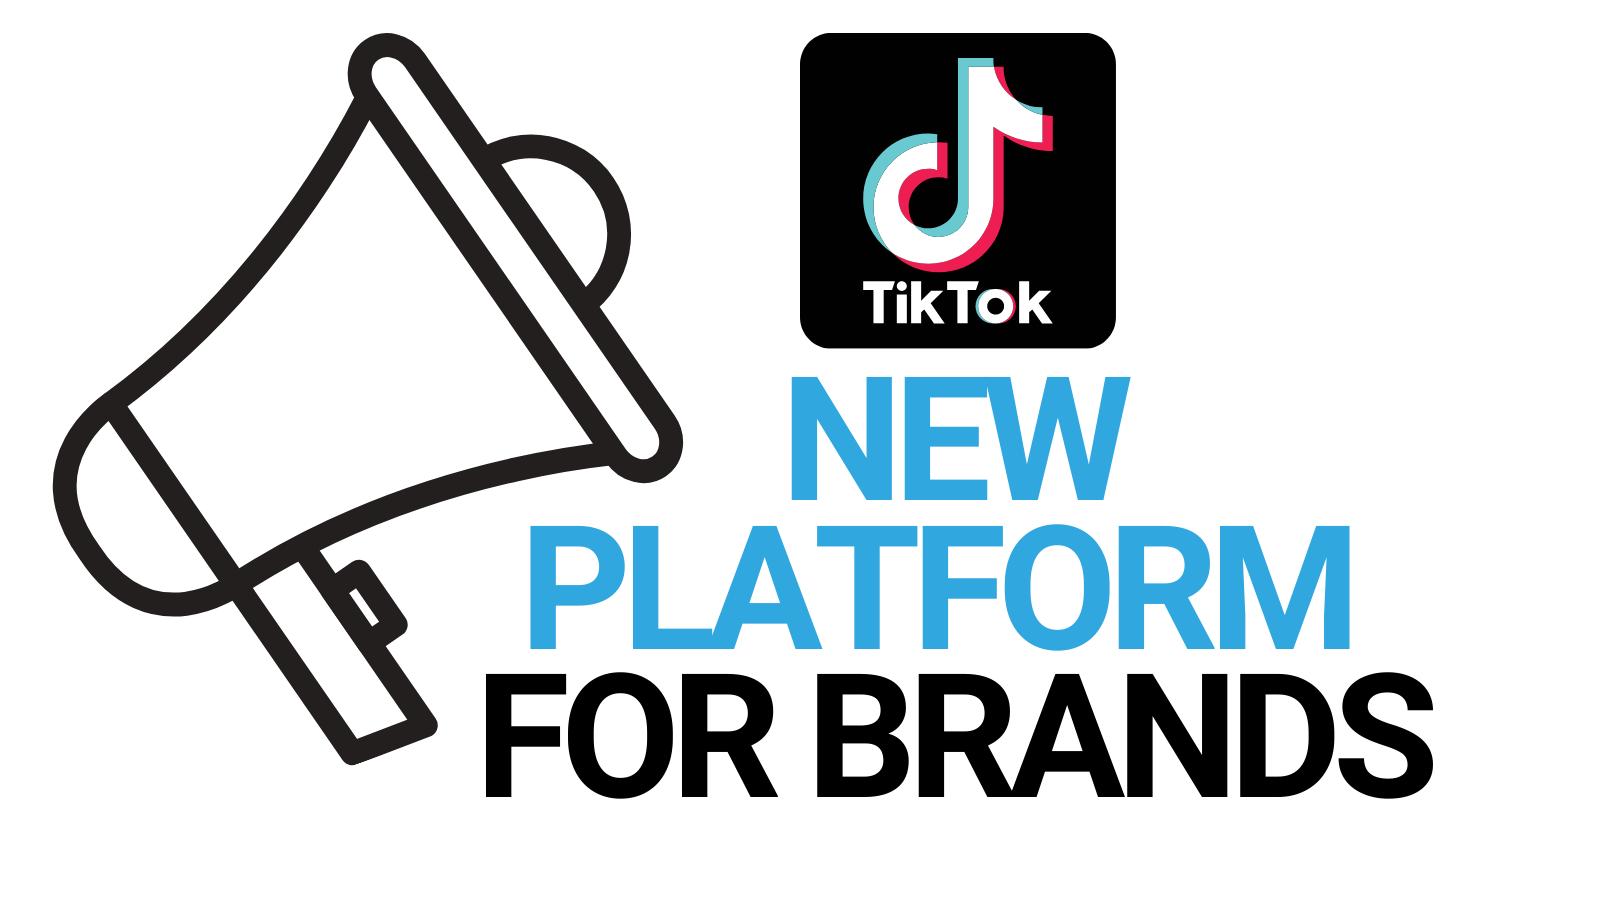 TikTok Launches New Platform For Brands